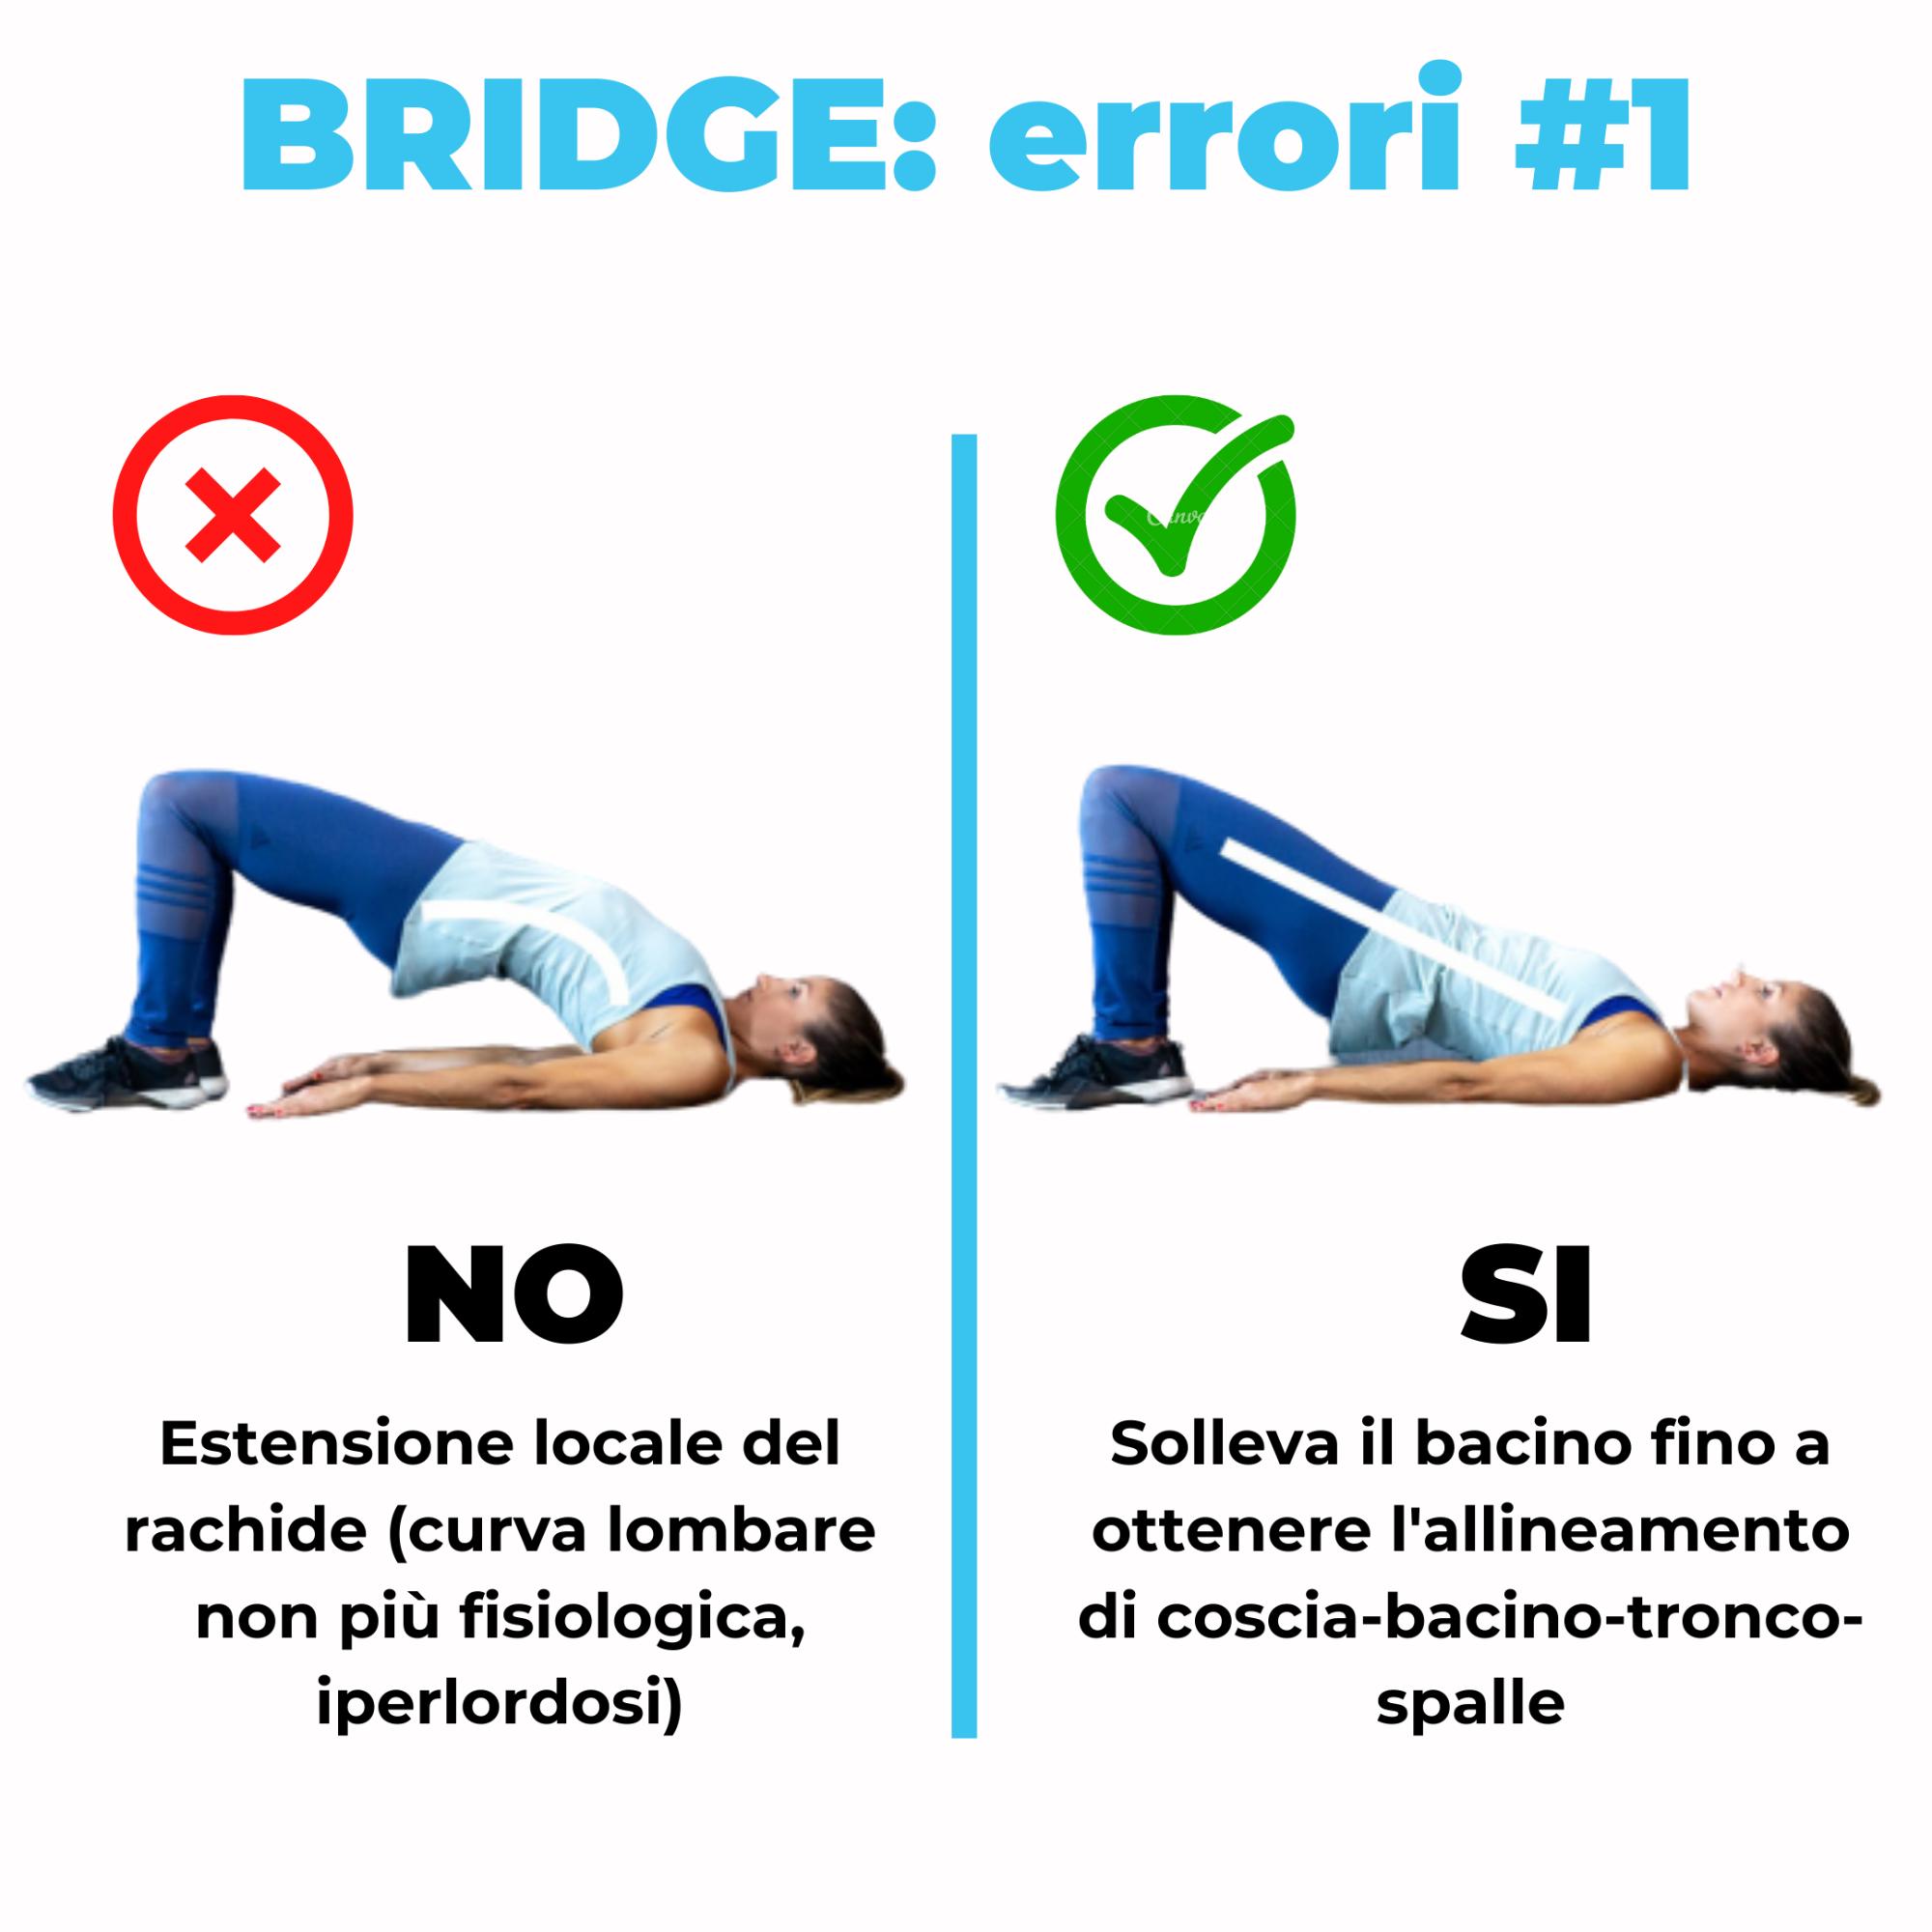 bridgeerrori1-1609149356.png